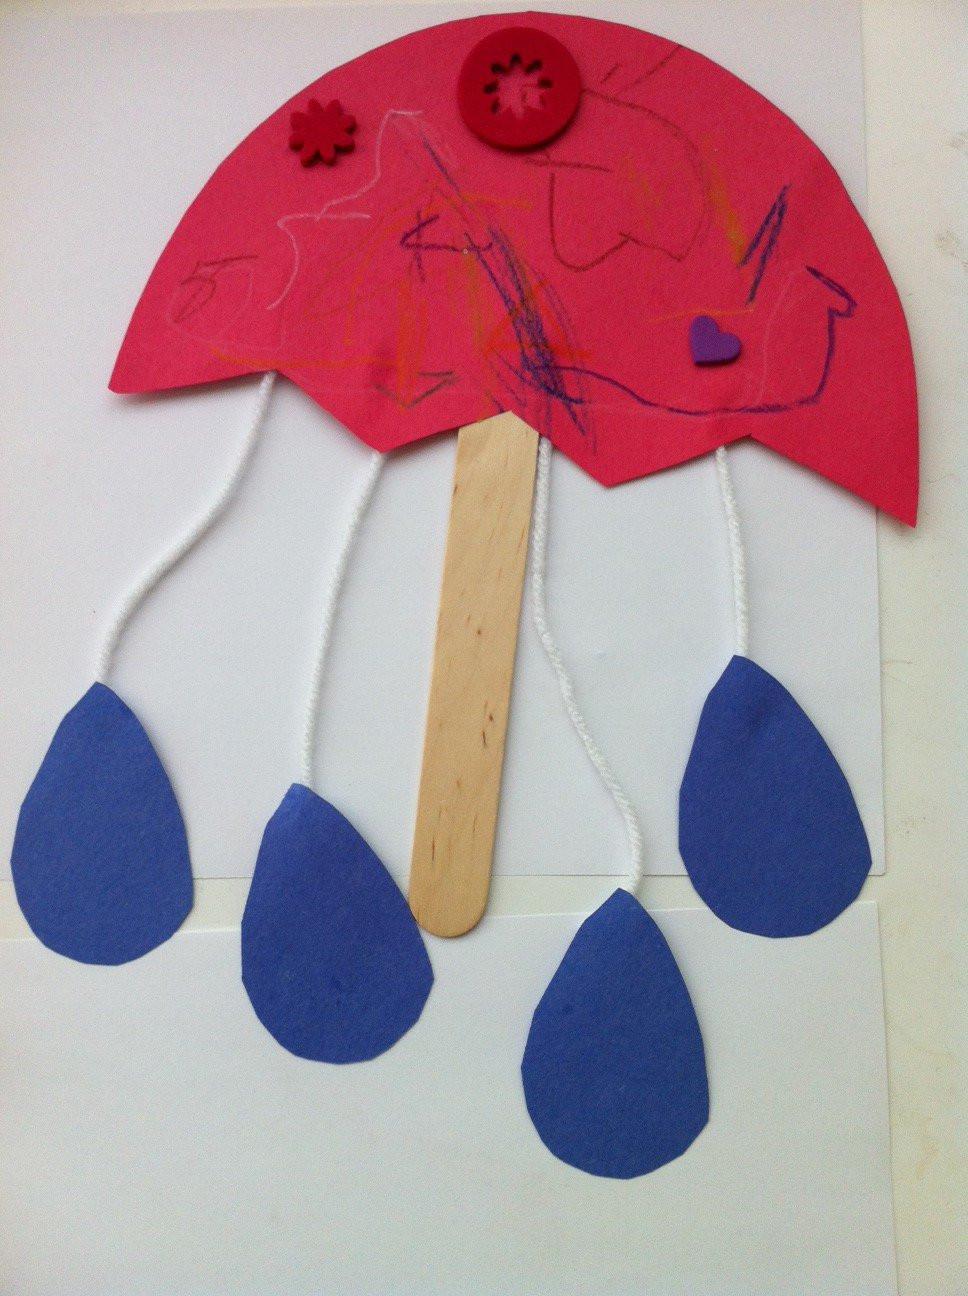 Best ideas about Craft Activities For Preschoolers . Save or Pin Letter U Crafts Preschool and Kindergarten Now.